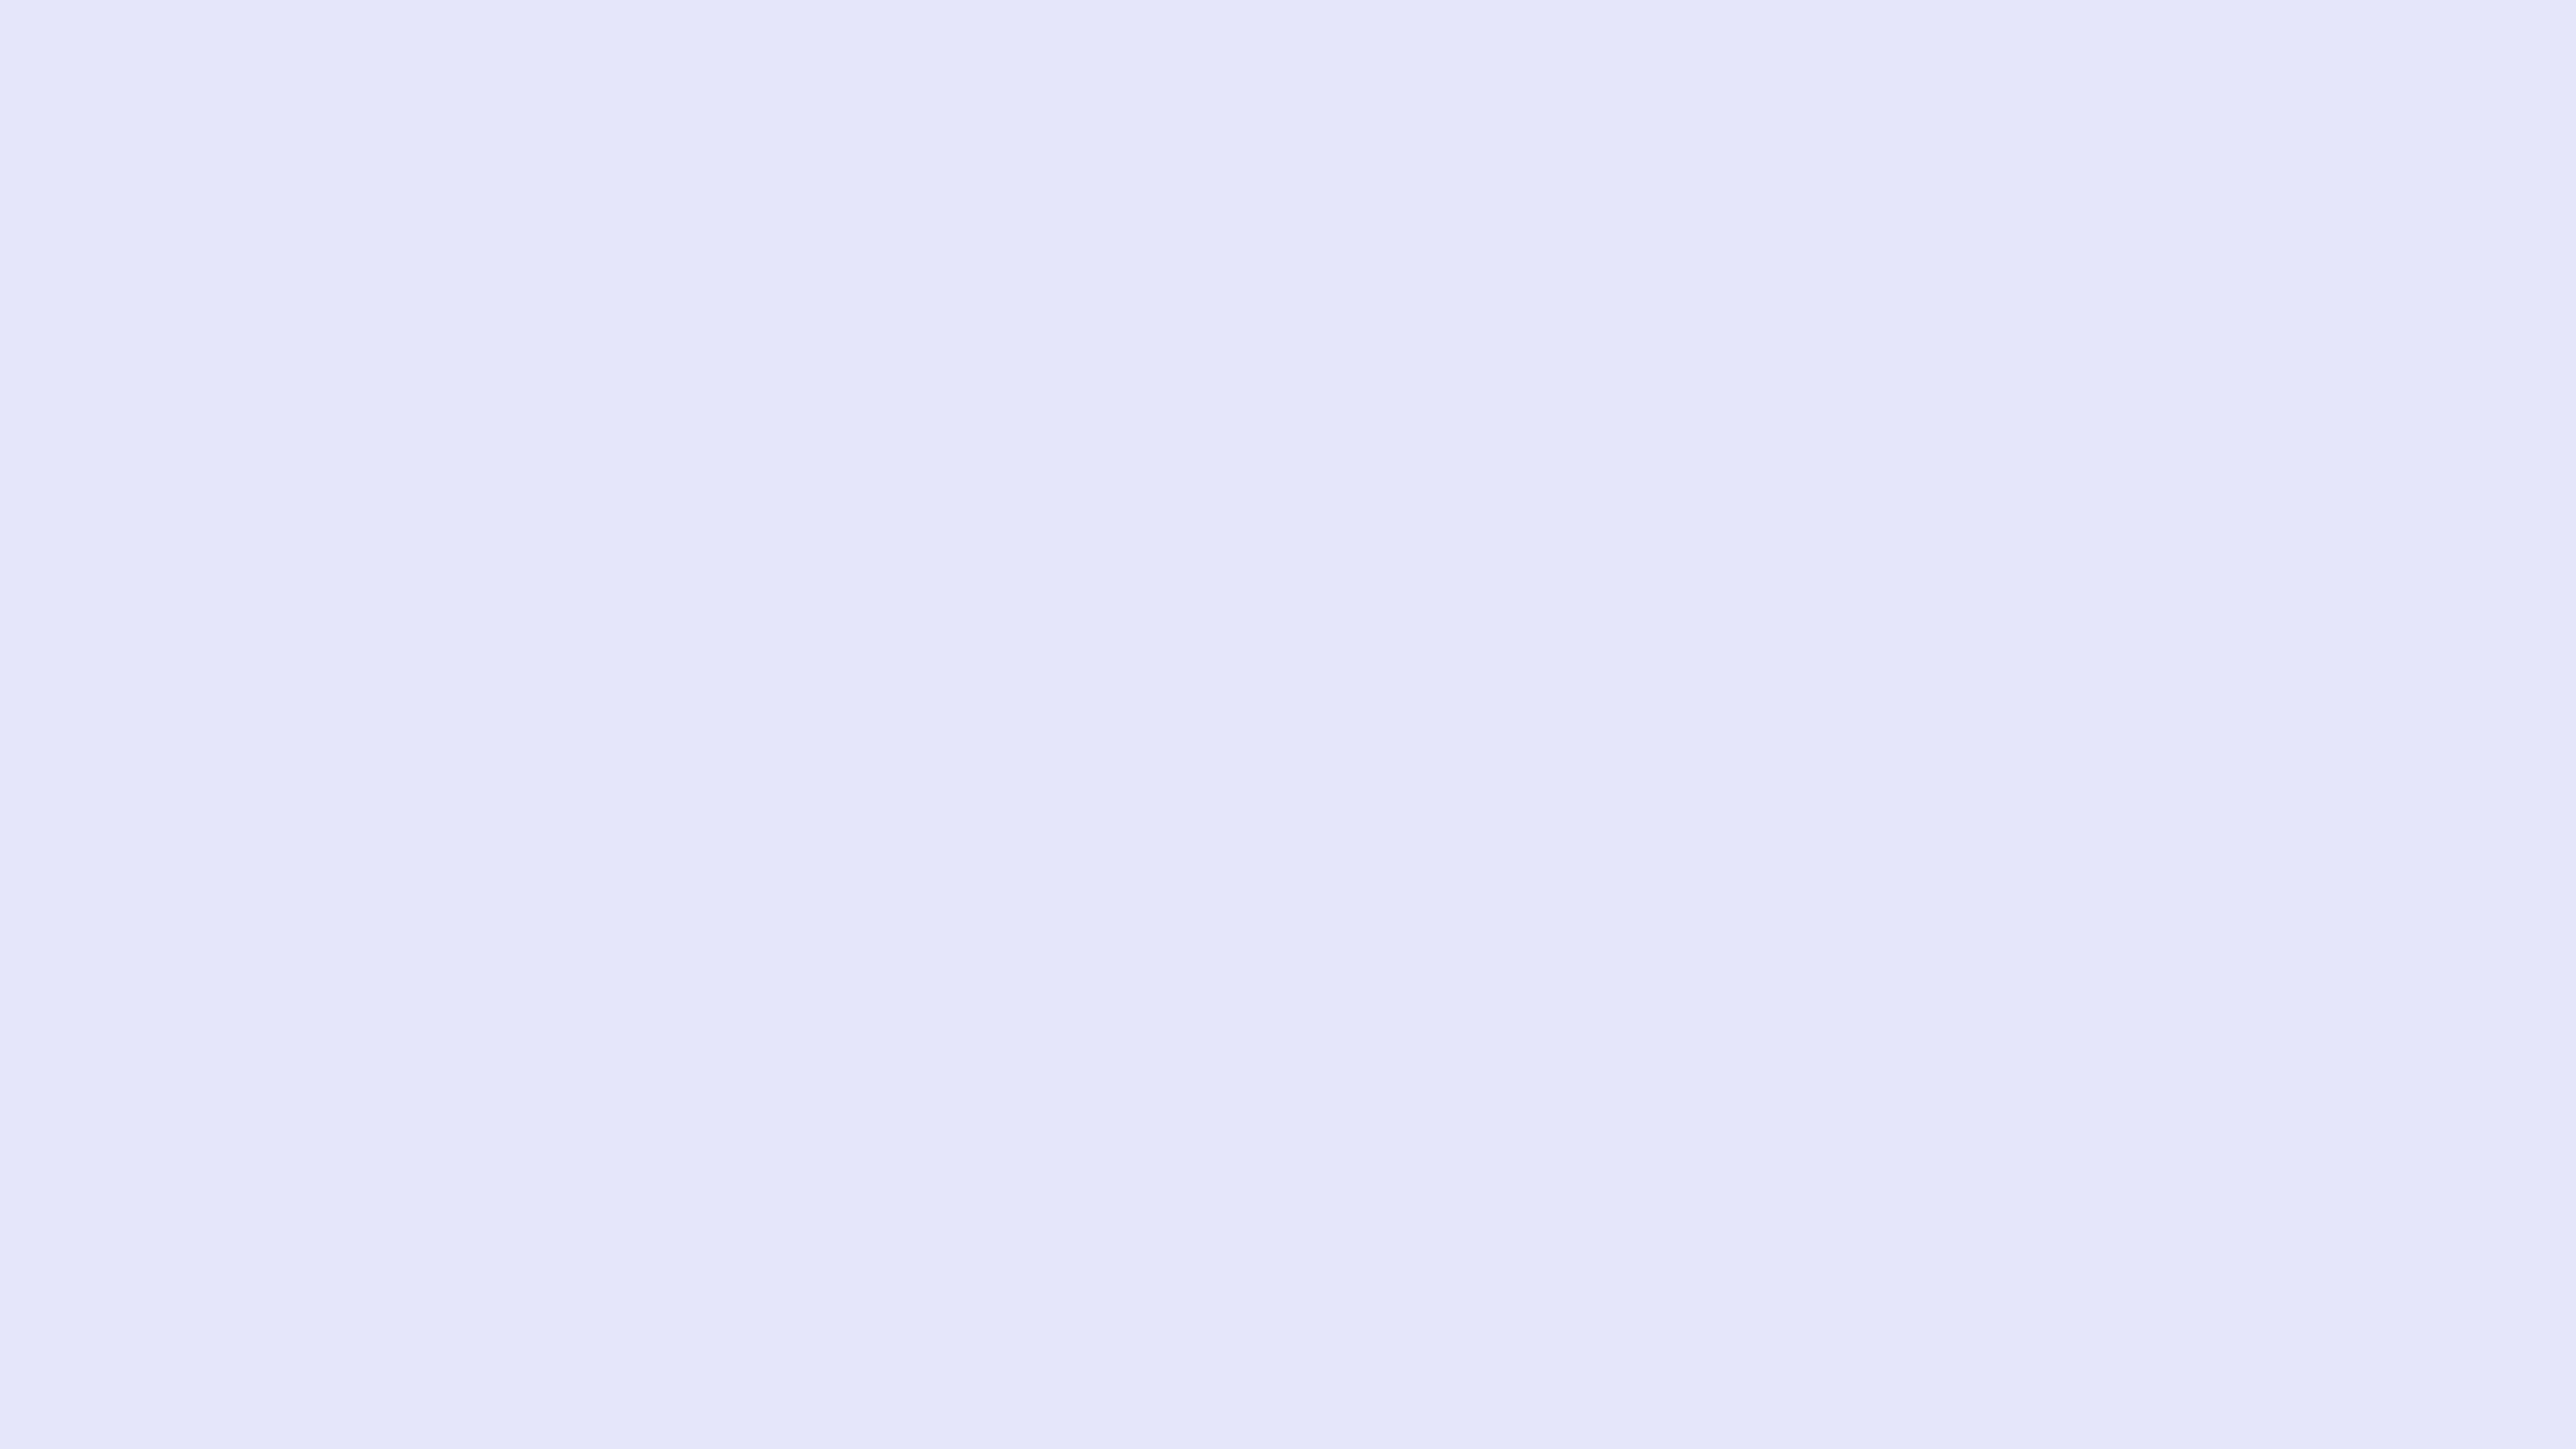 7680x4320 Lavender Web Solid Color Background